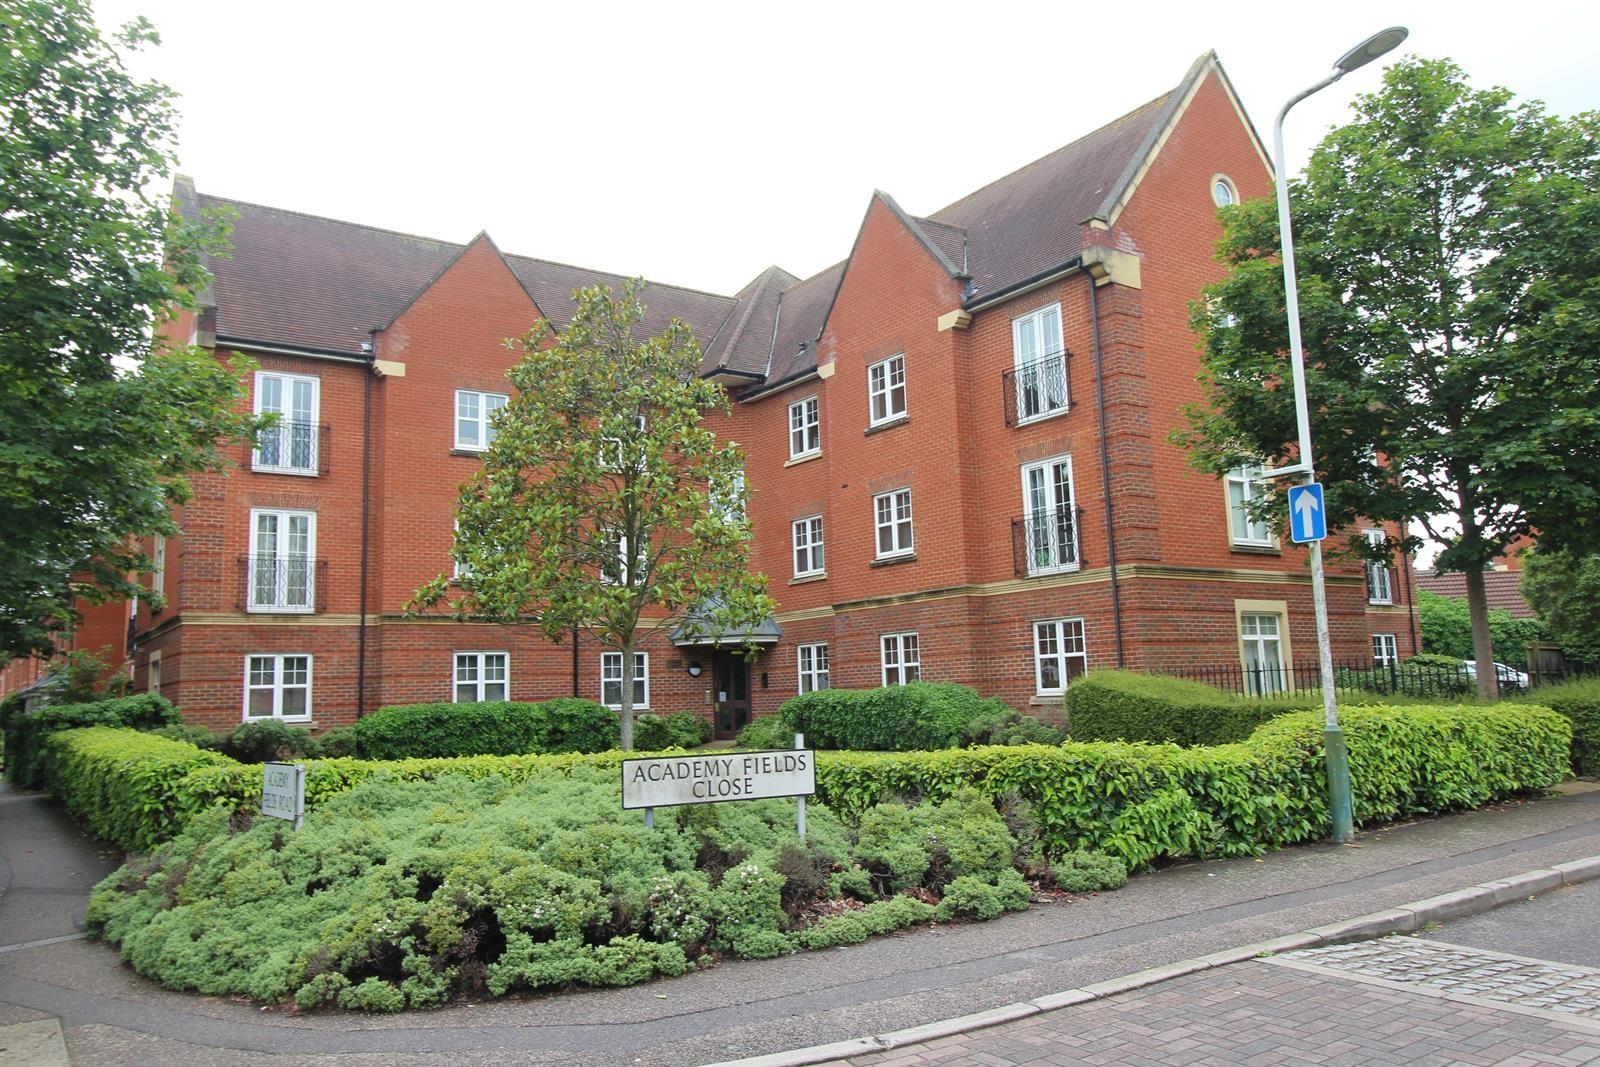 Scholars Court, Academy Fields Road, Romford, Essex, RM2